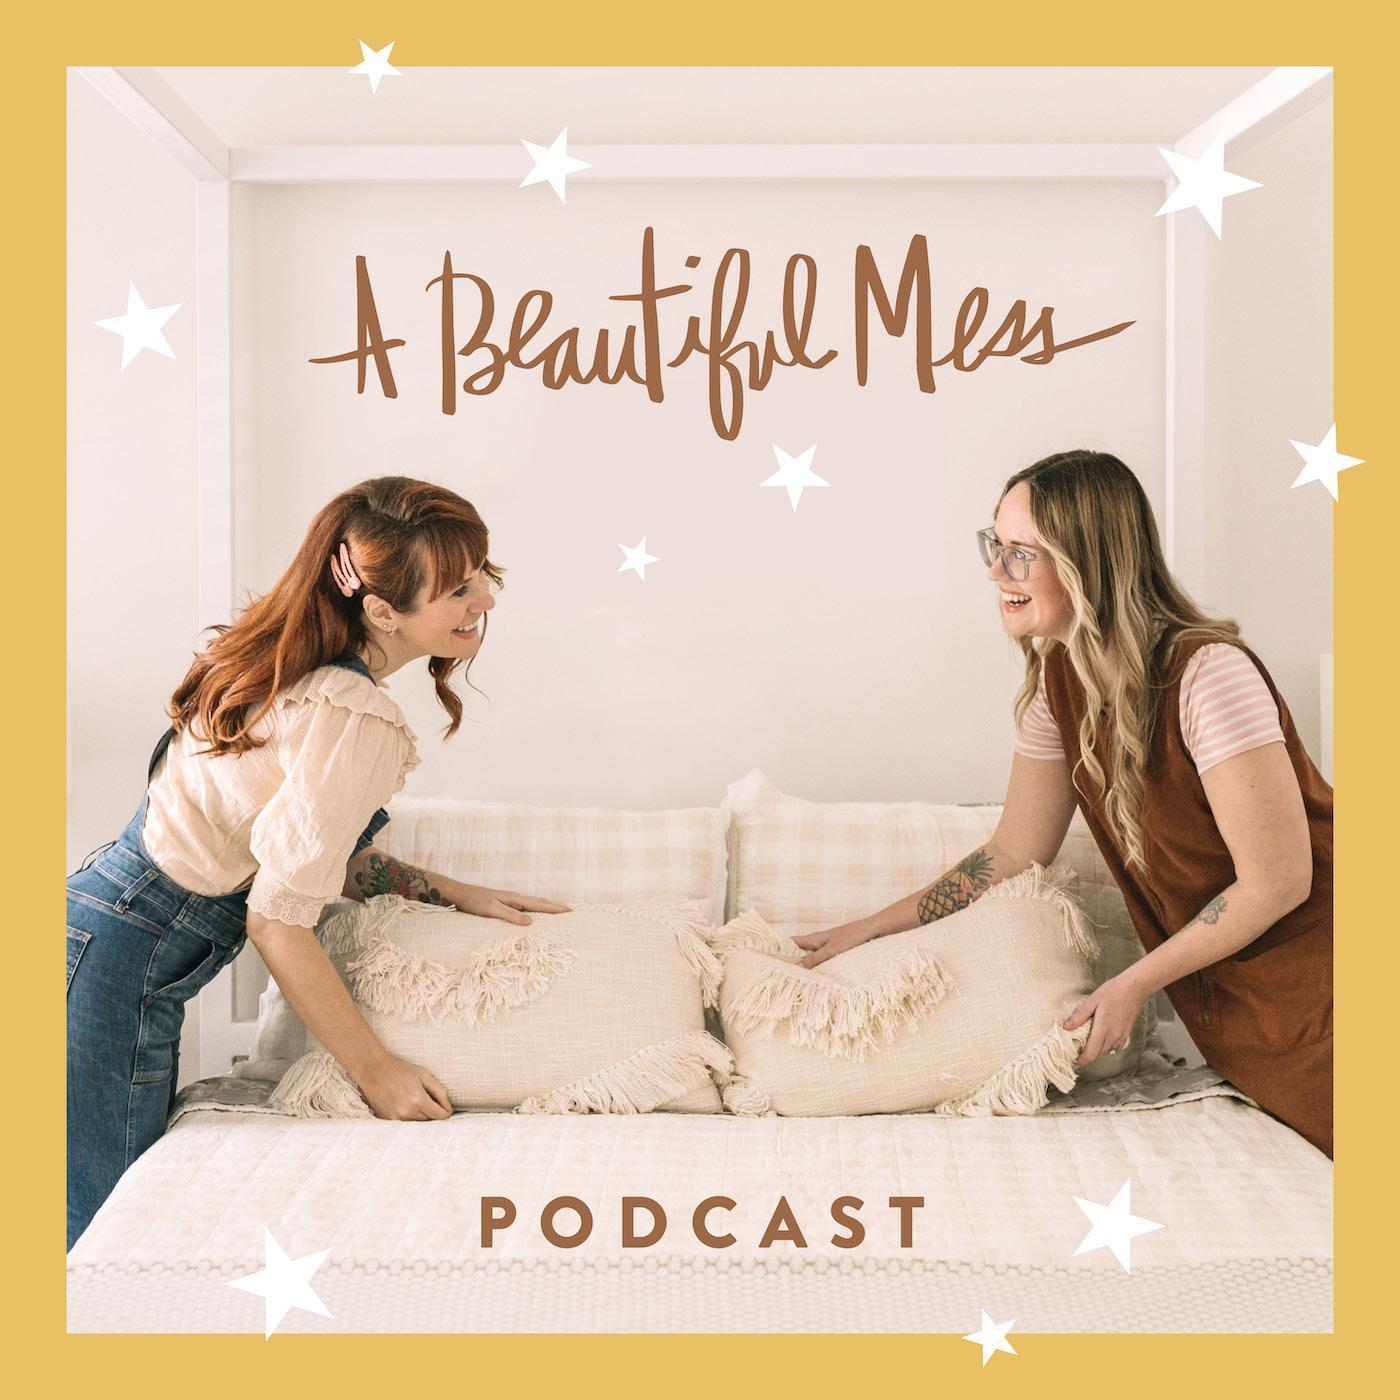 A Beautiful Mess Podcast show art